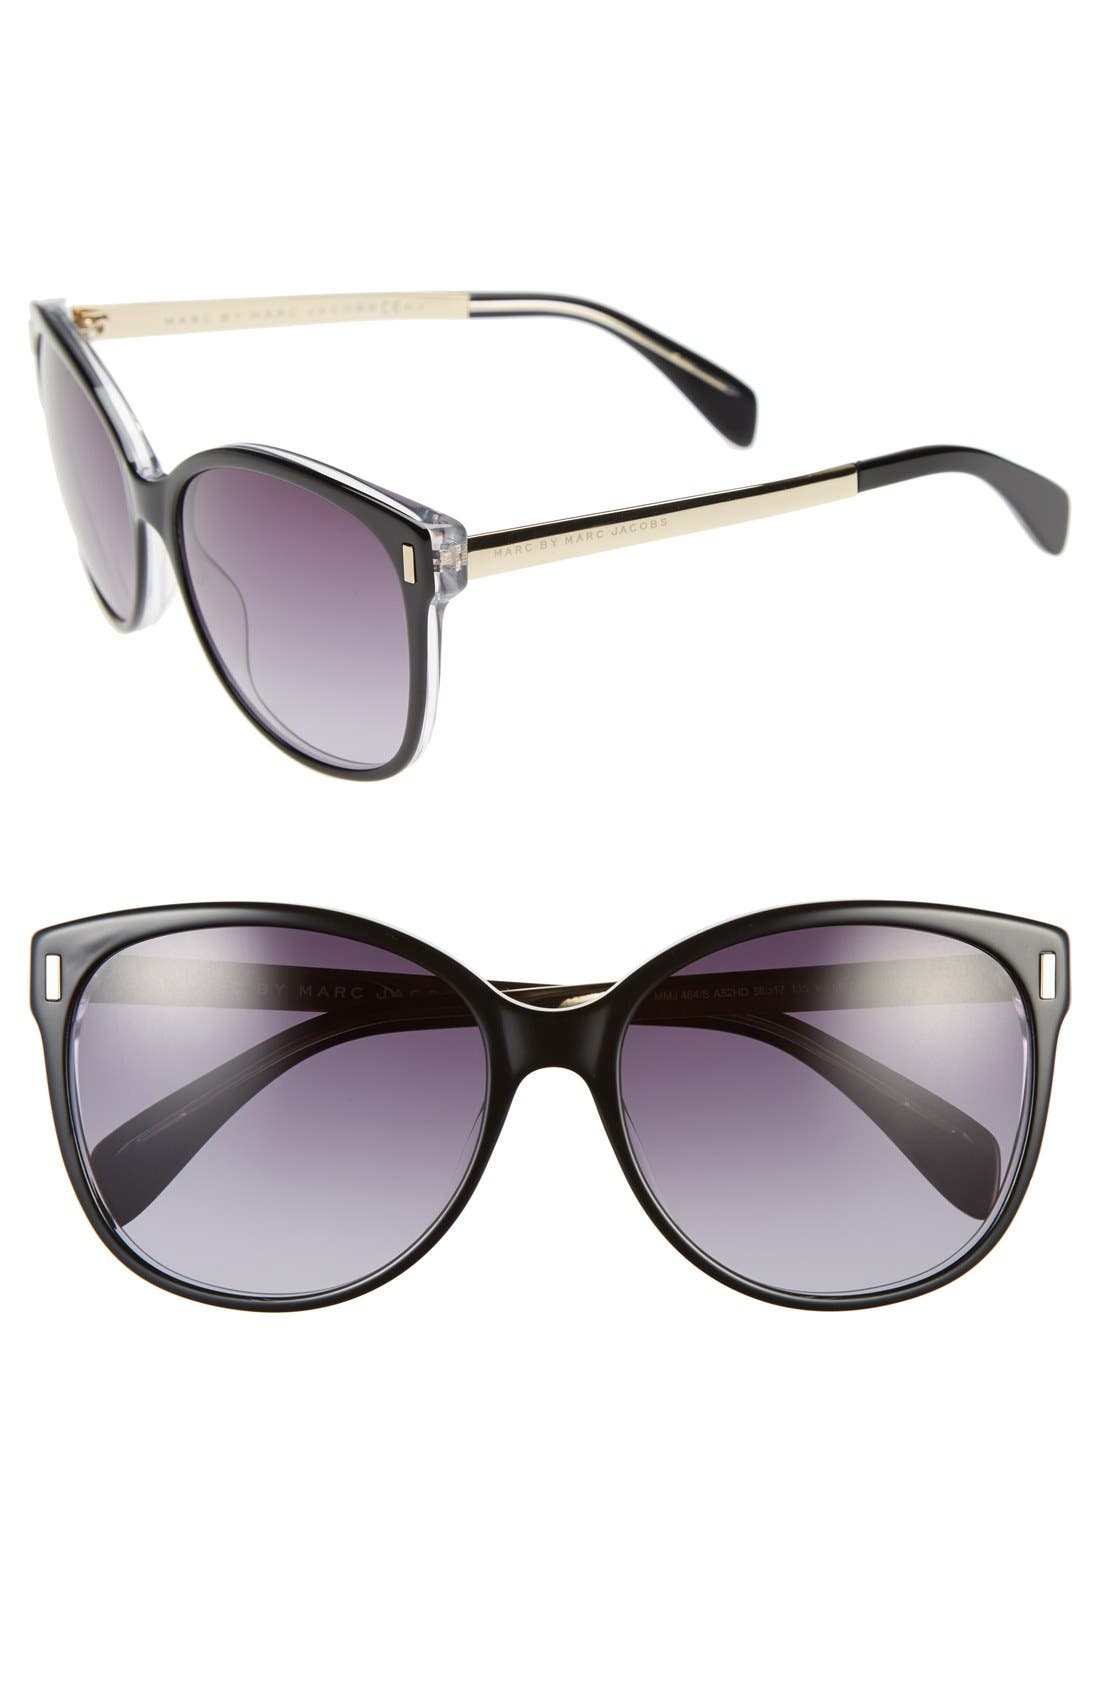 MARC BY MARC JACOBS, 56mm Retro Sunglasses, Main thumbnail 1, color, 001